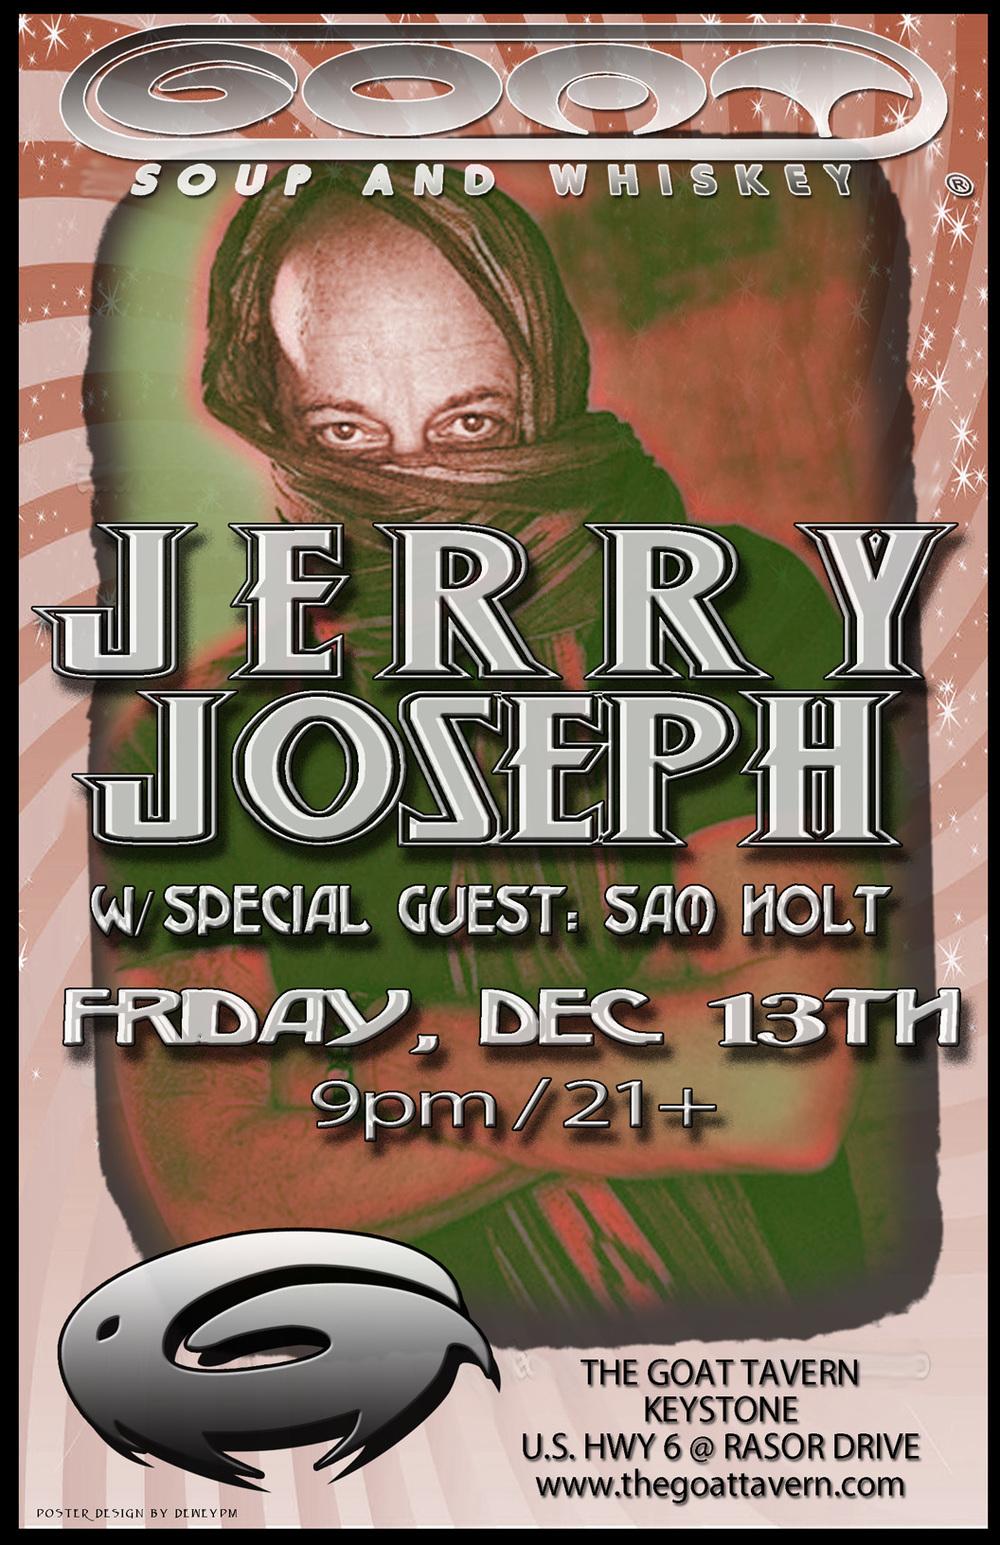 JERRY-JOSEPH-2013-F-WEB.jpg